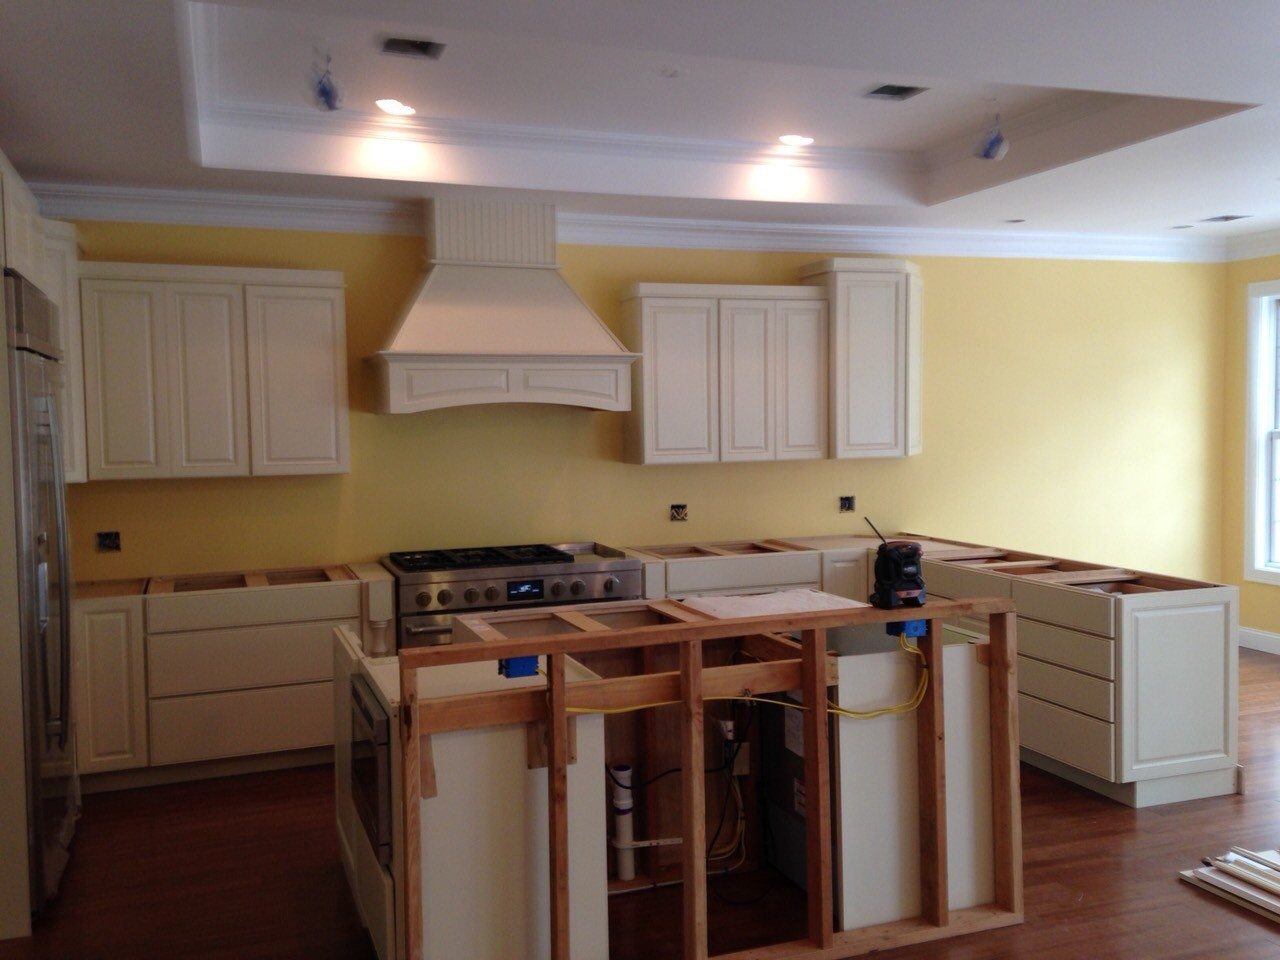 Cabinet Painting Pro Painters Llc